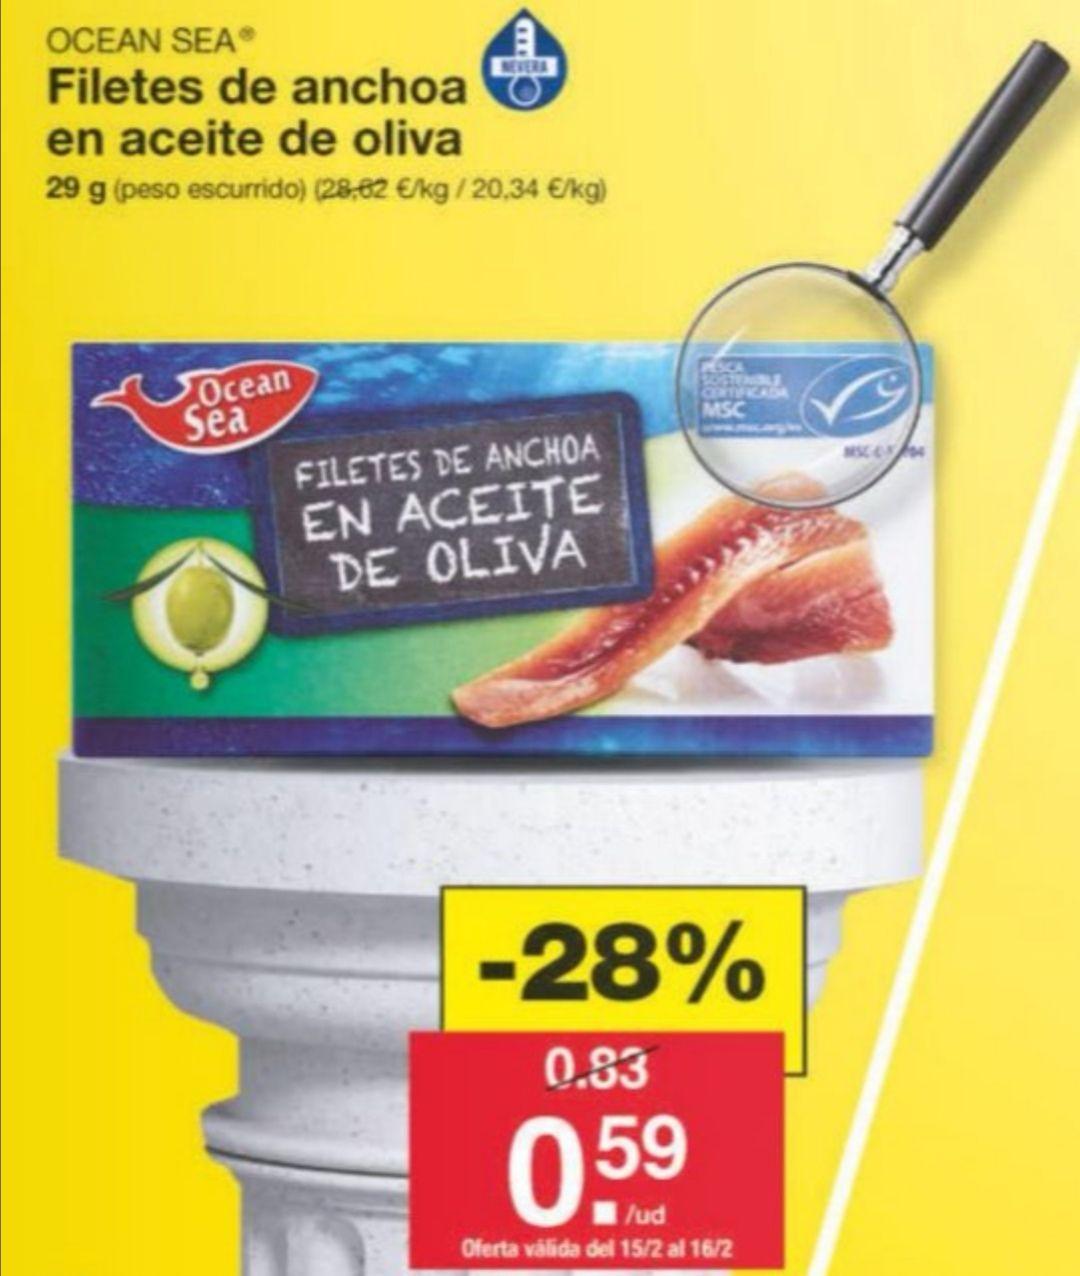 Filetes de anchoas en aceite de oliva 0.58 €. LIDL